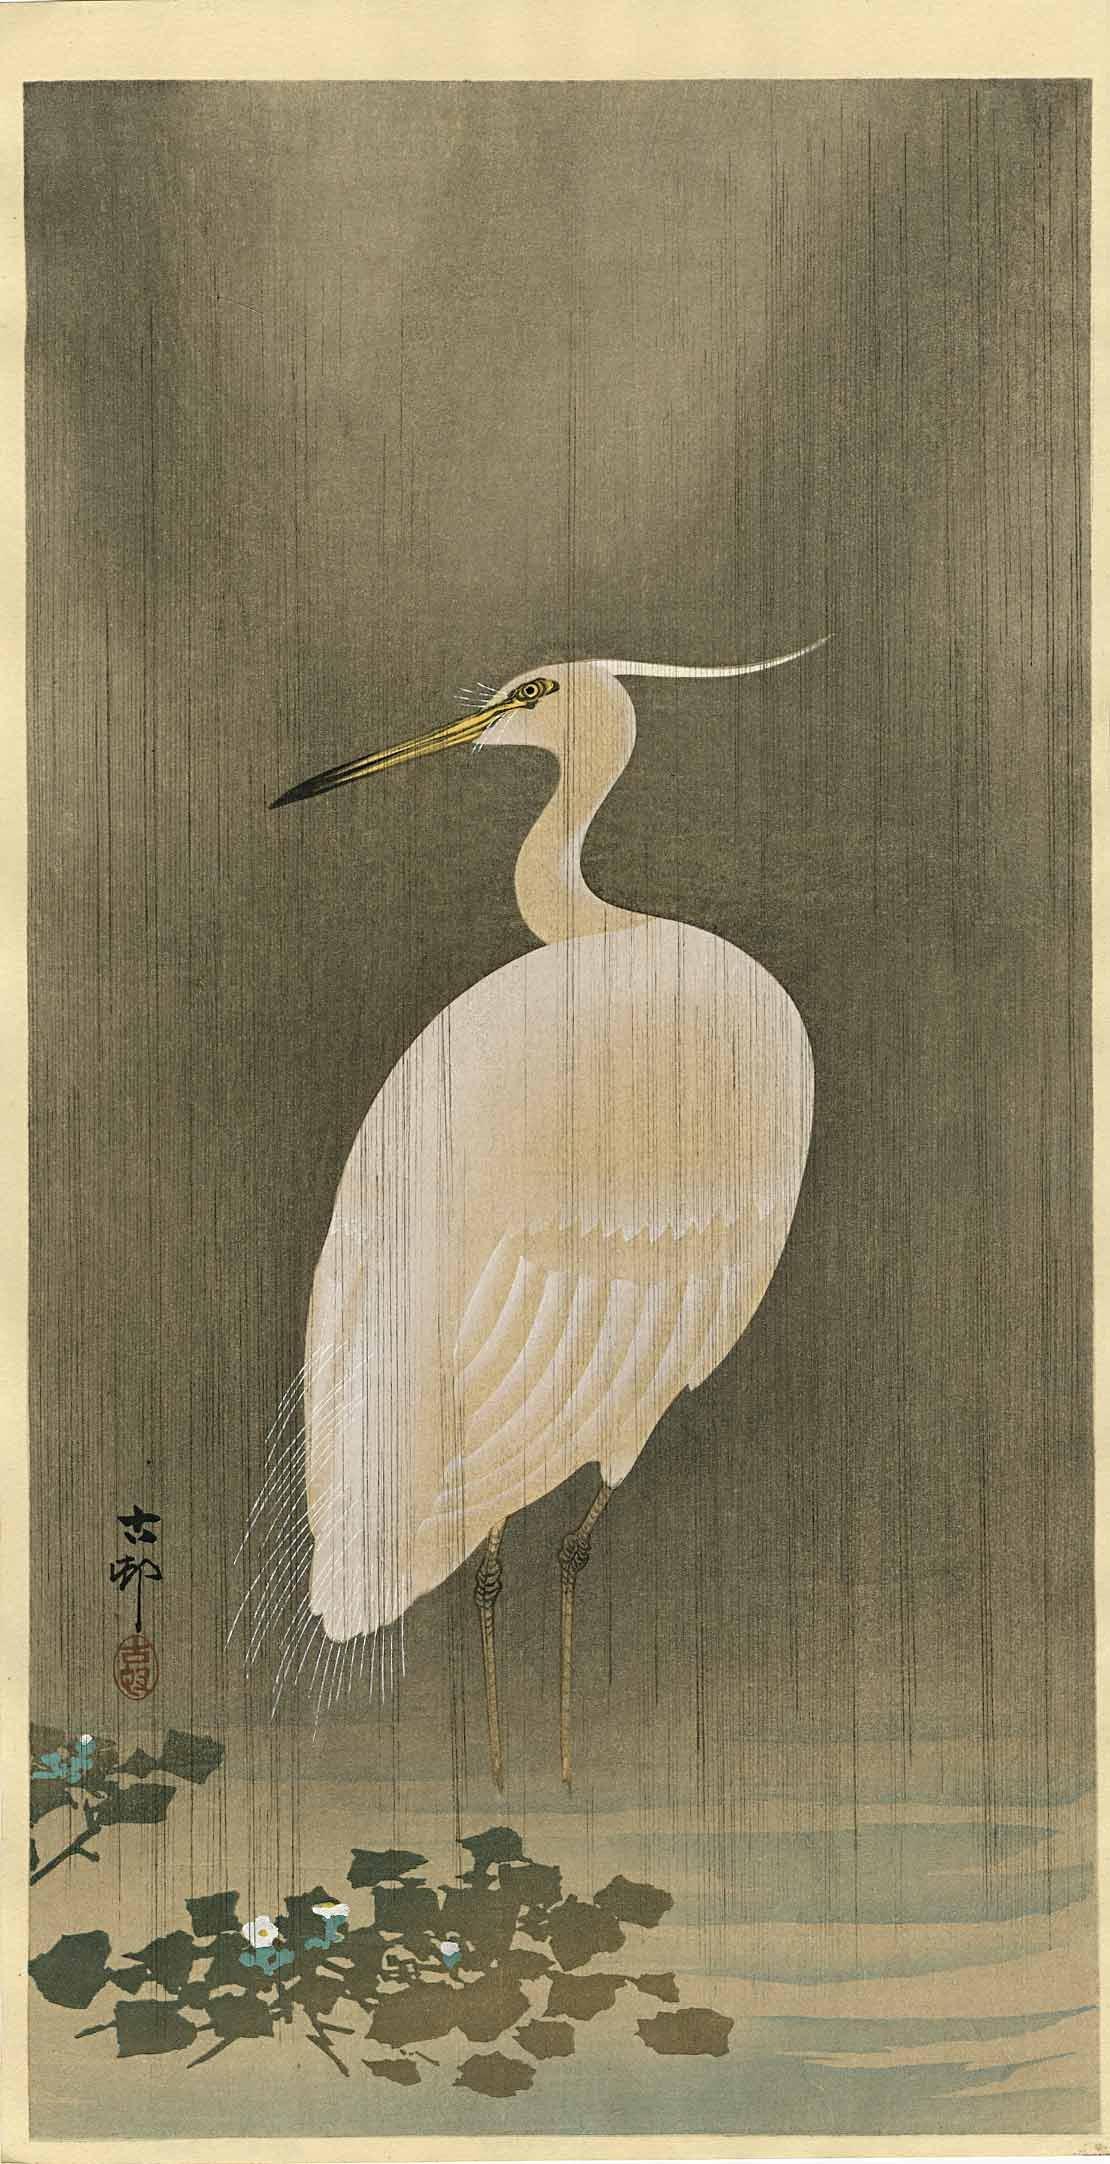 Koson Ohara: Egret Wading in Rain 1920s Woodblock